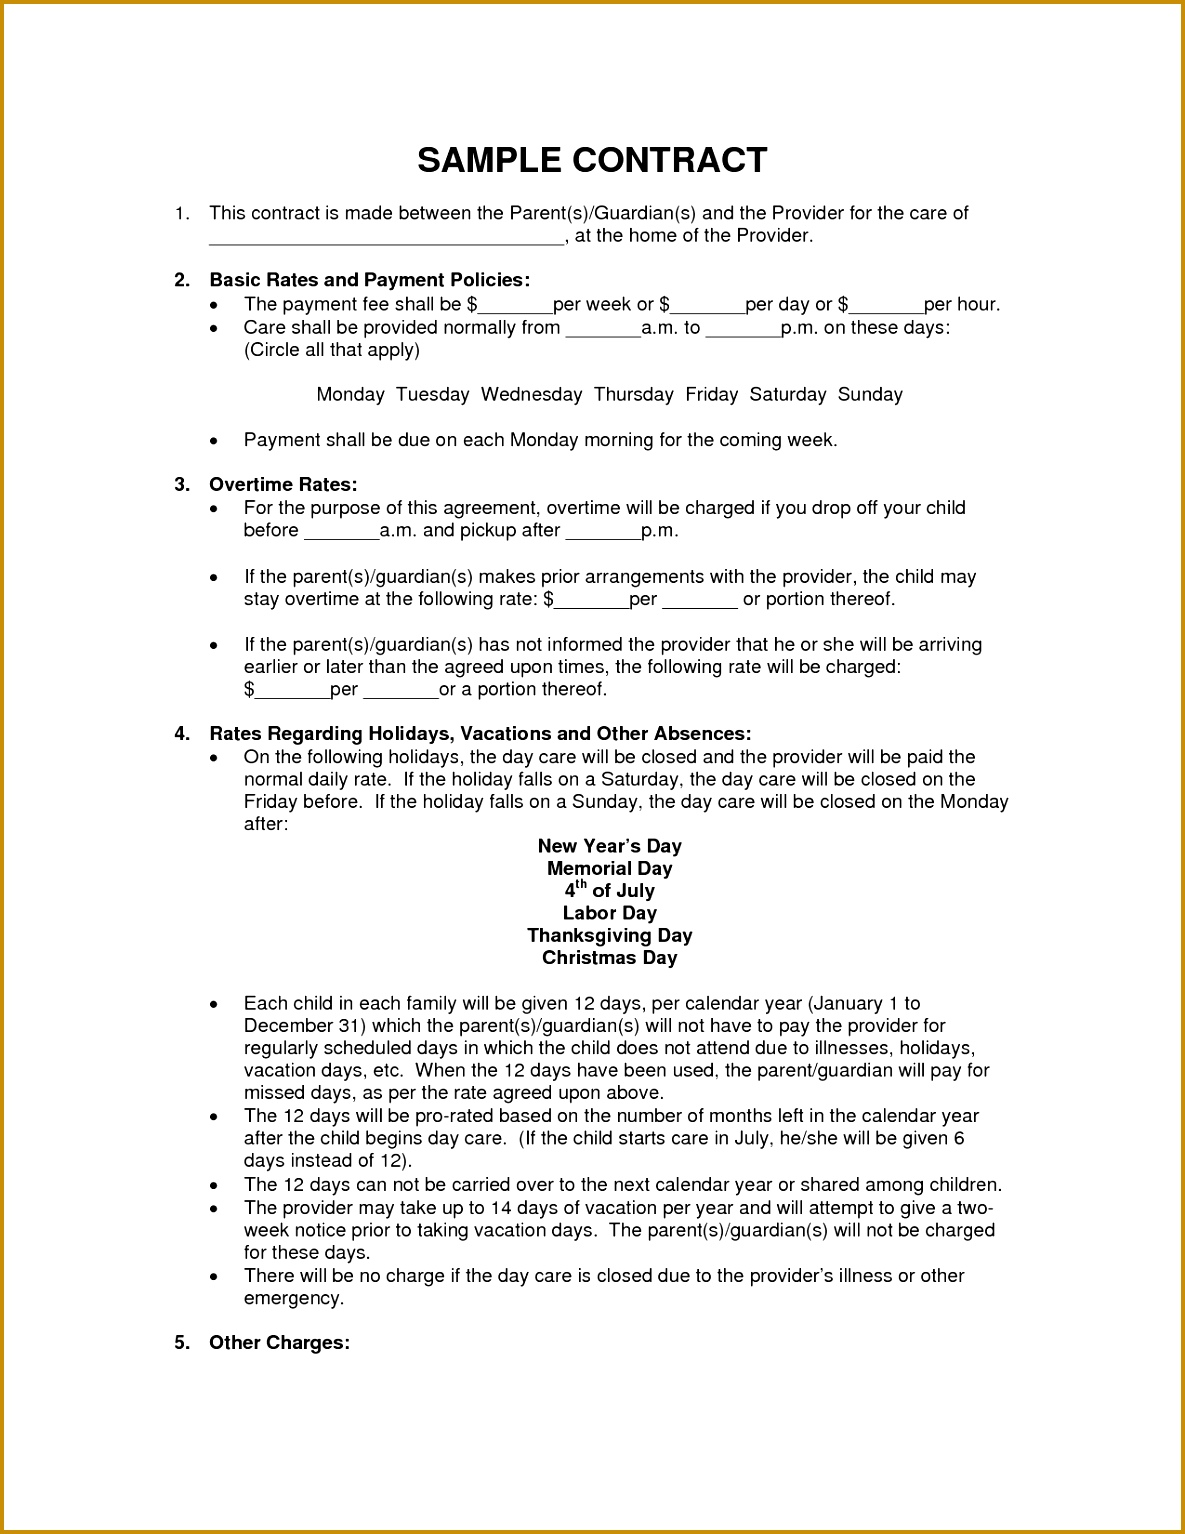 scope of work template 11851534